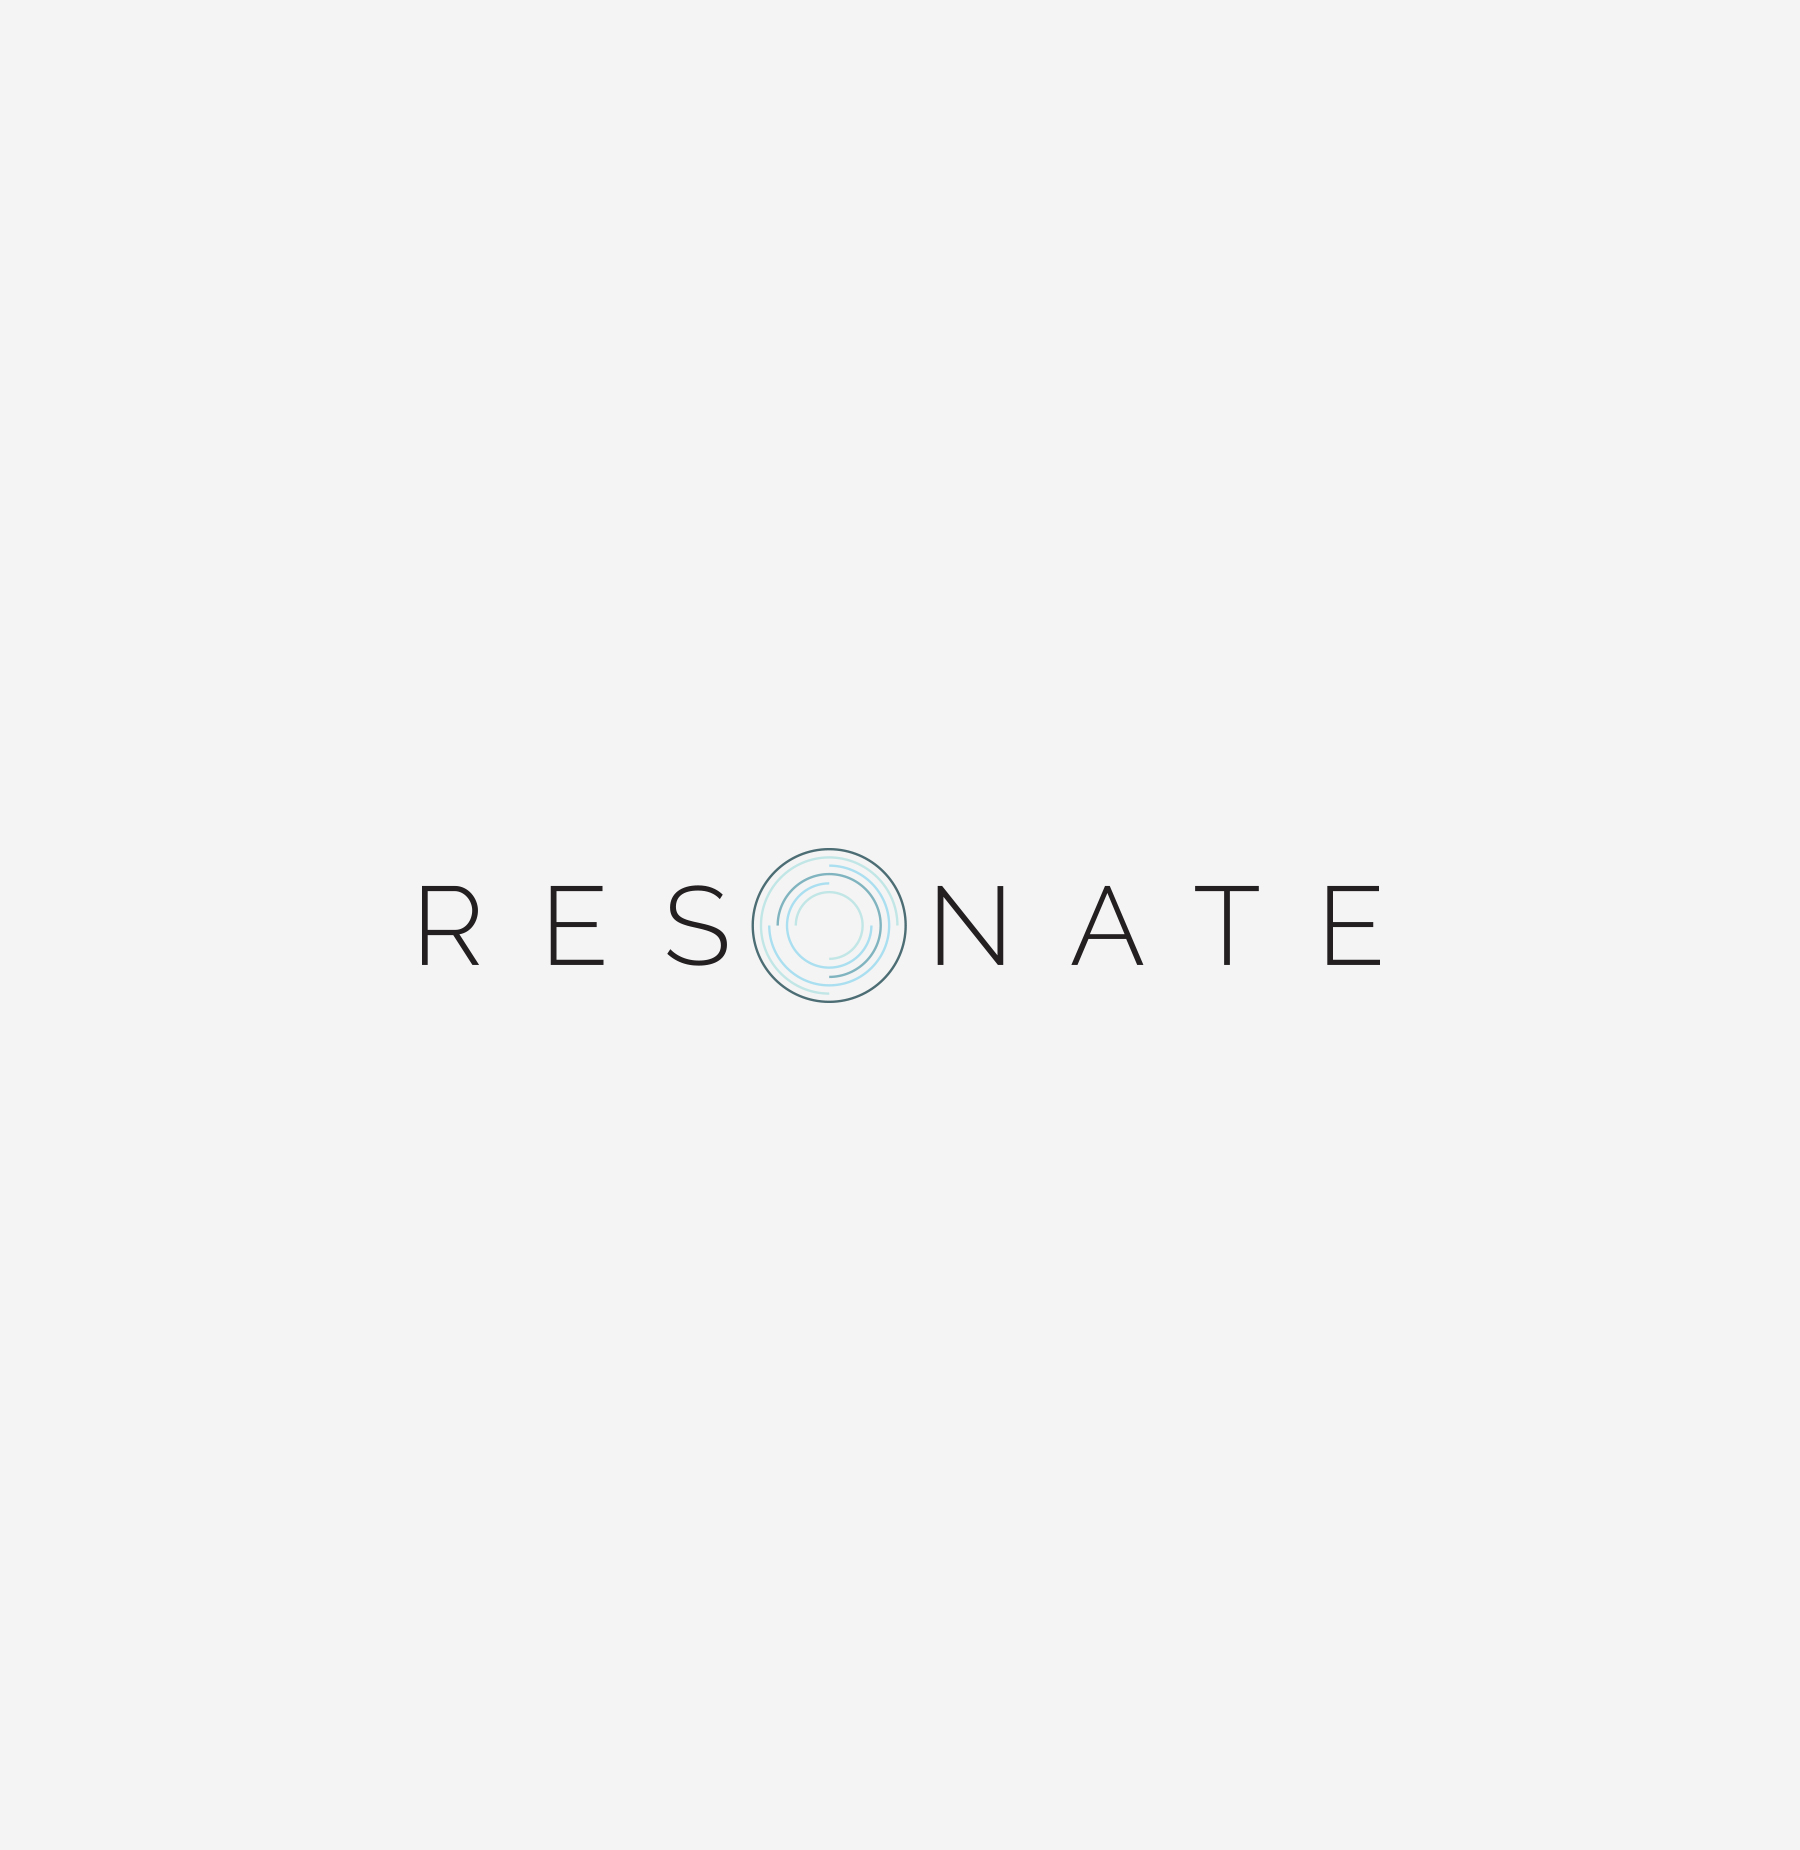 Resonate_Logo.jpg